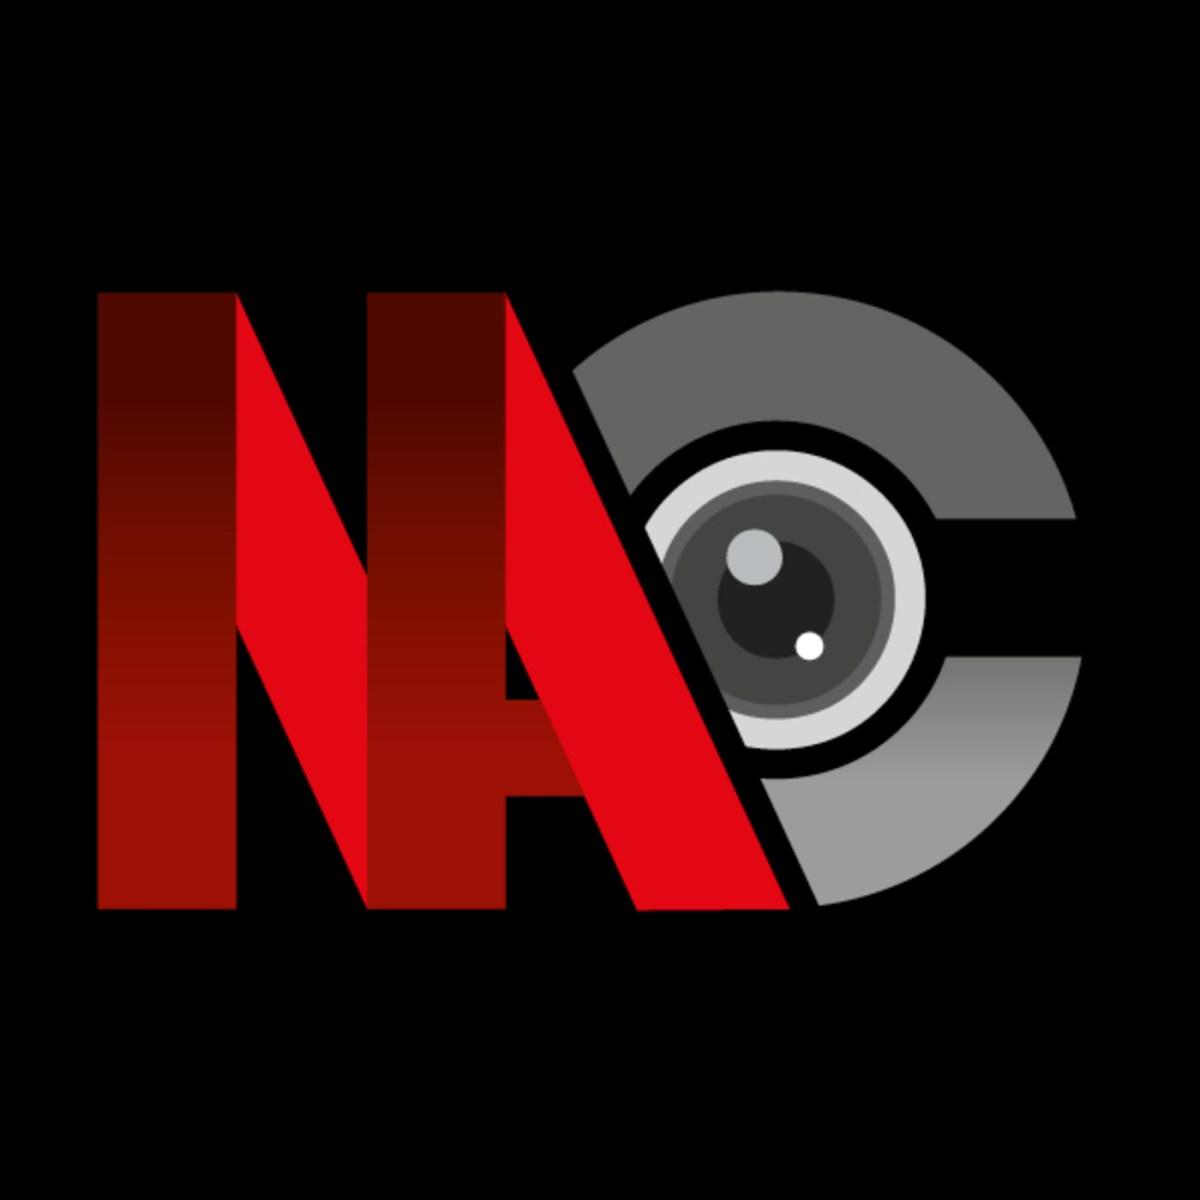 Netflix a la Carta (NaC)